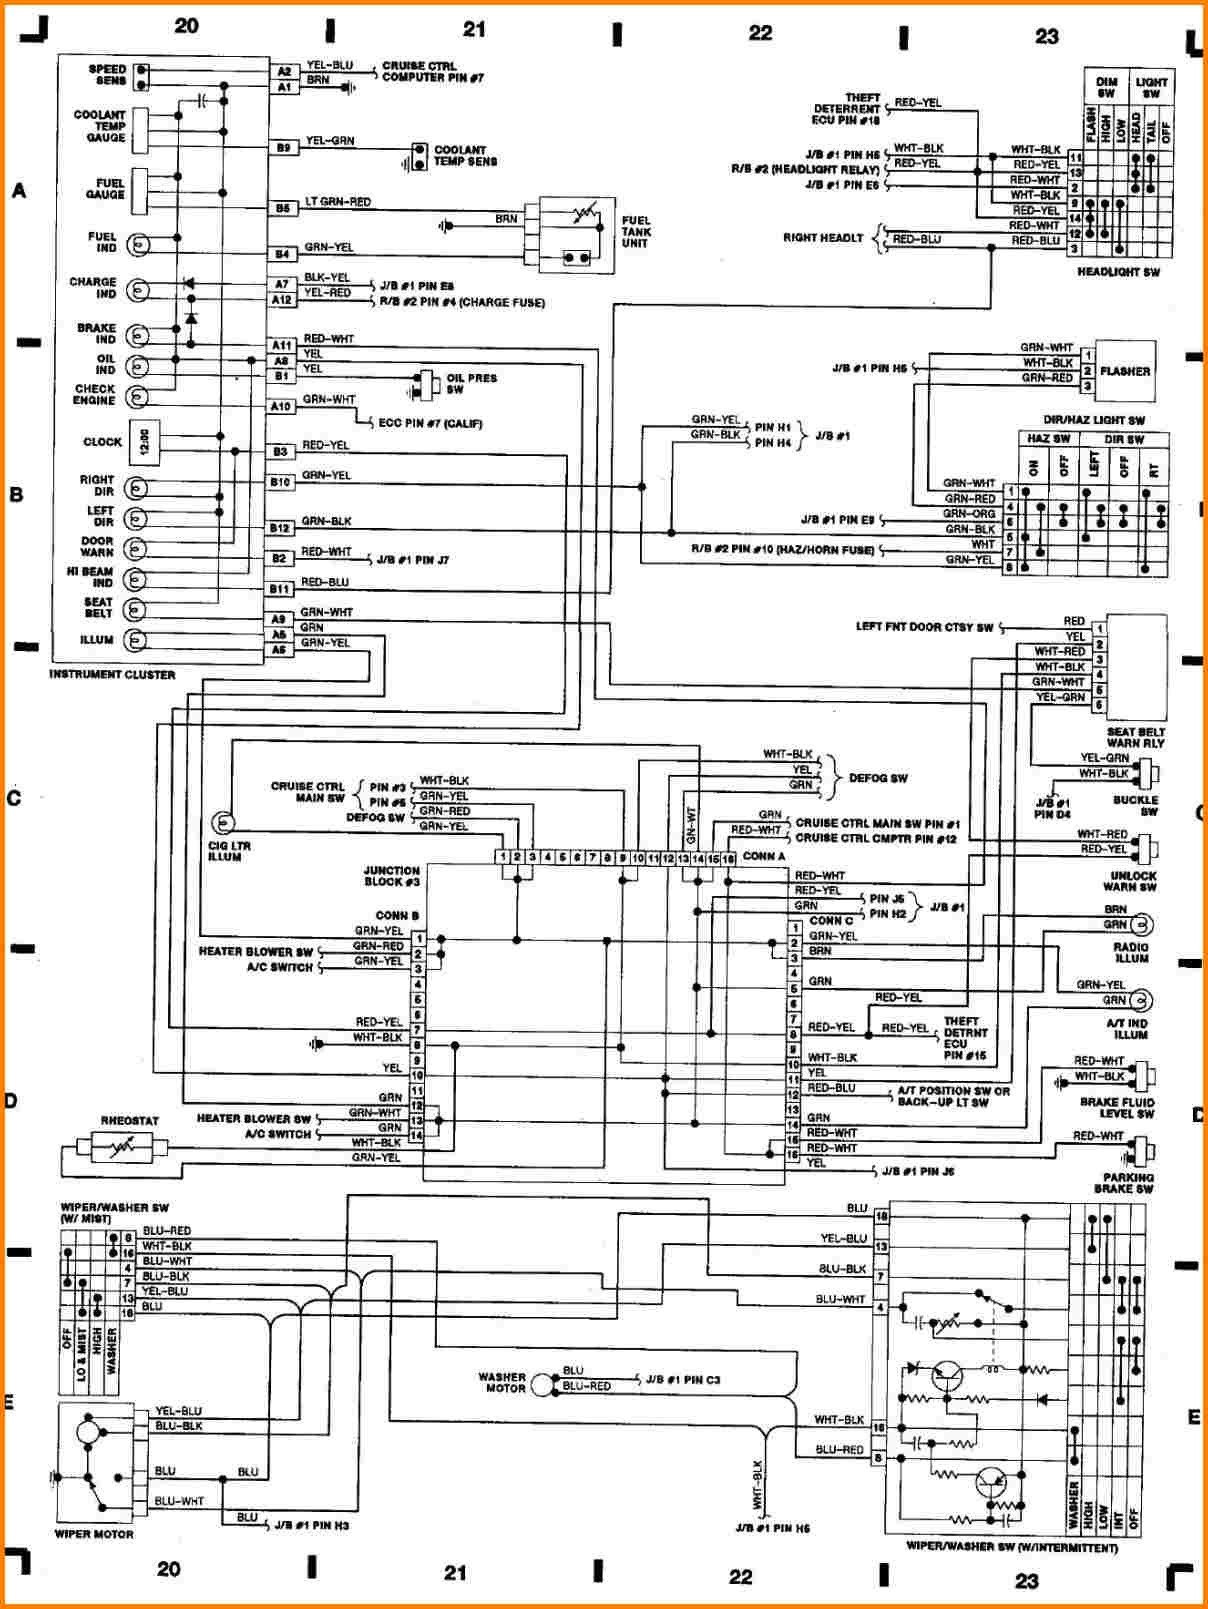 2012 Toyota Tundra Wiring Diagram New Toyota Tundra Trailer Wiring - Toyota Tundra Trailer Wiring Harness Diagram